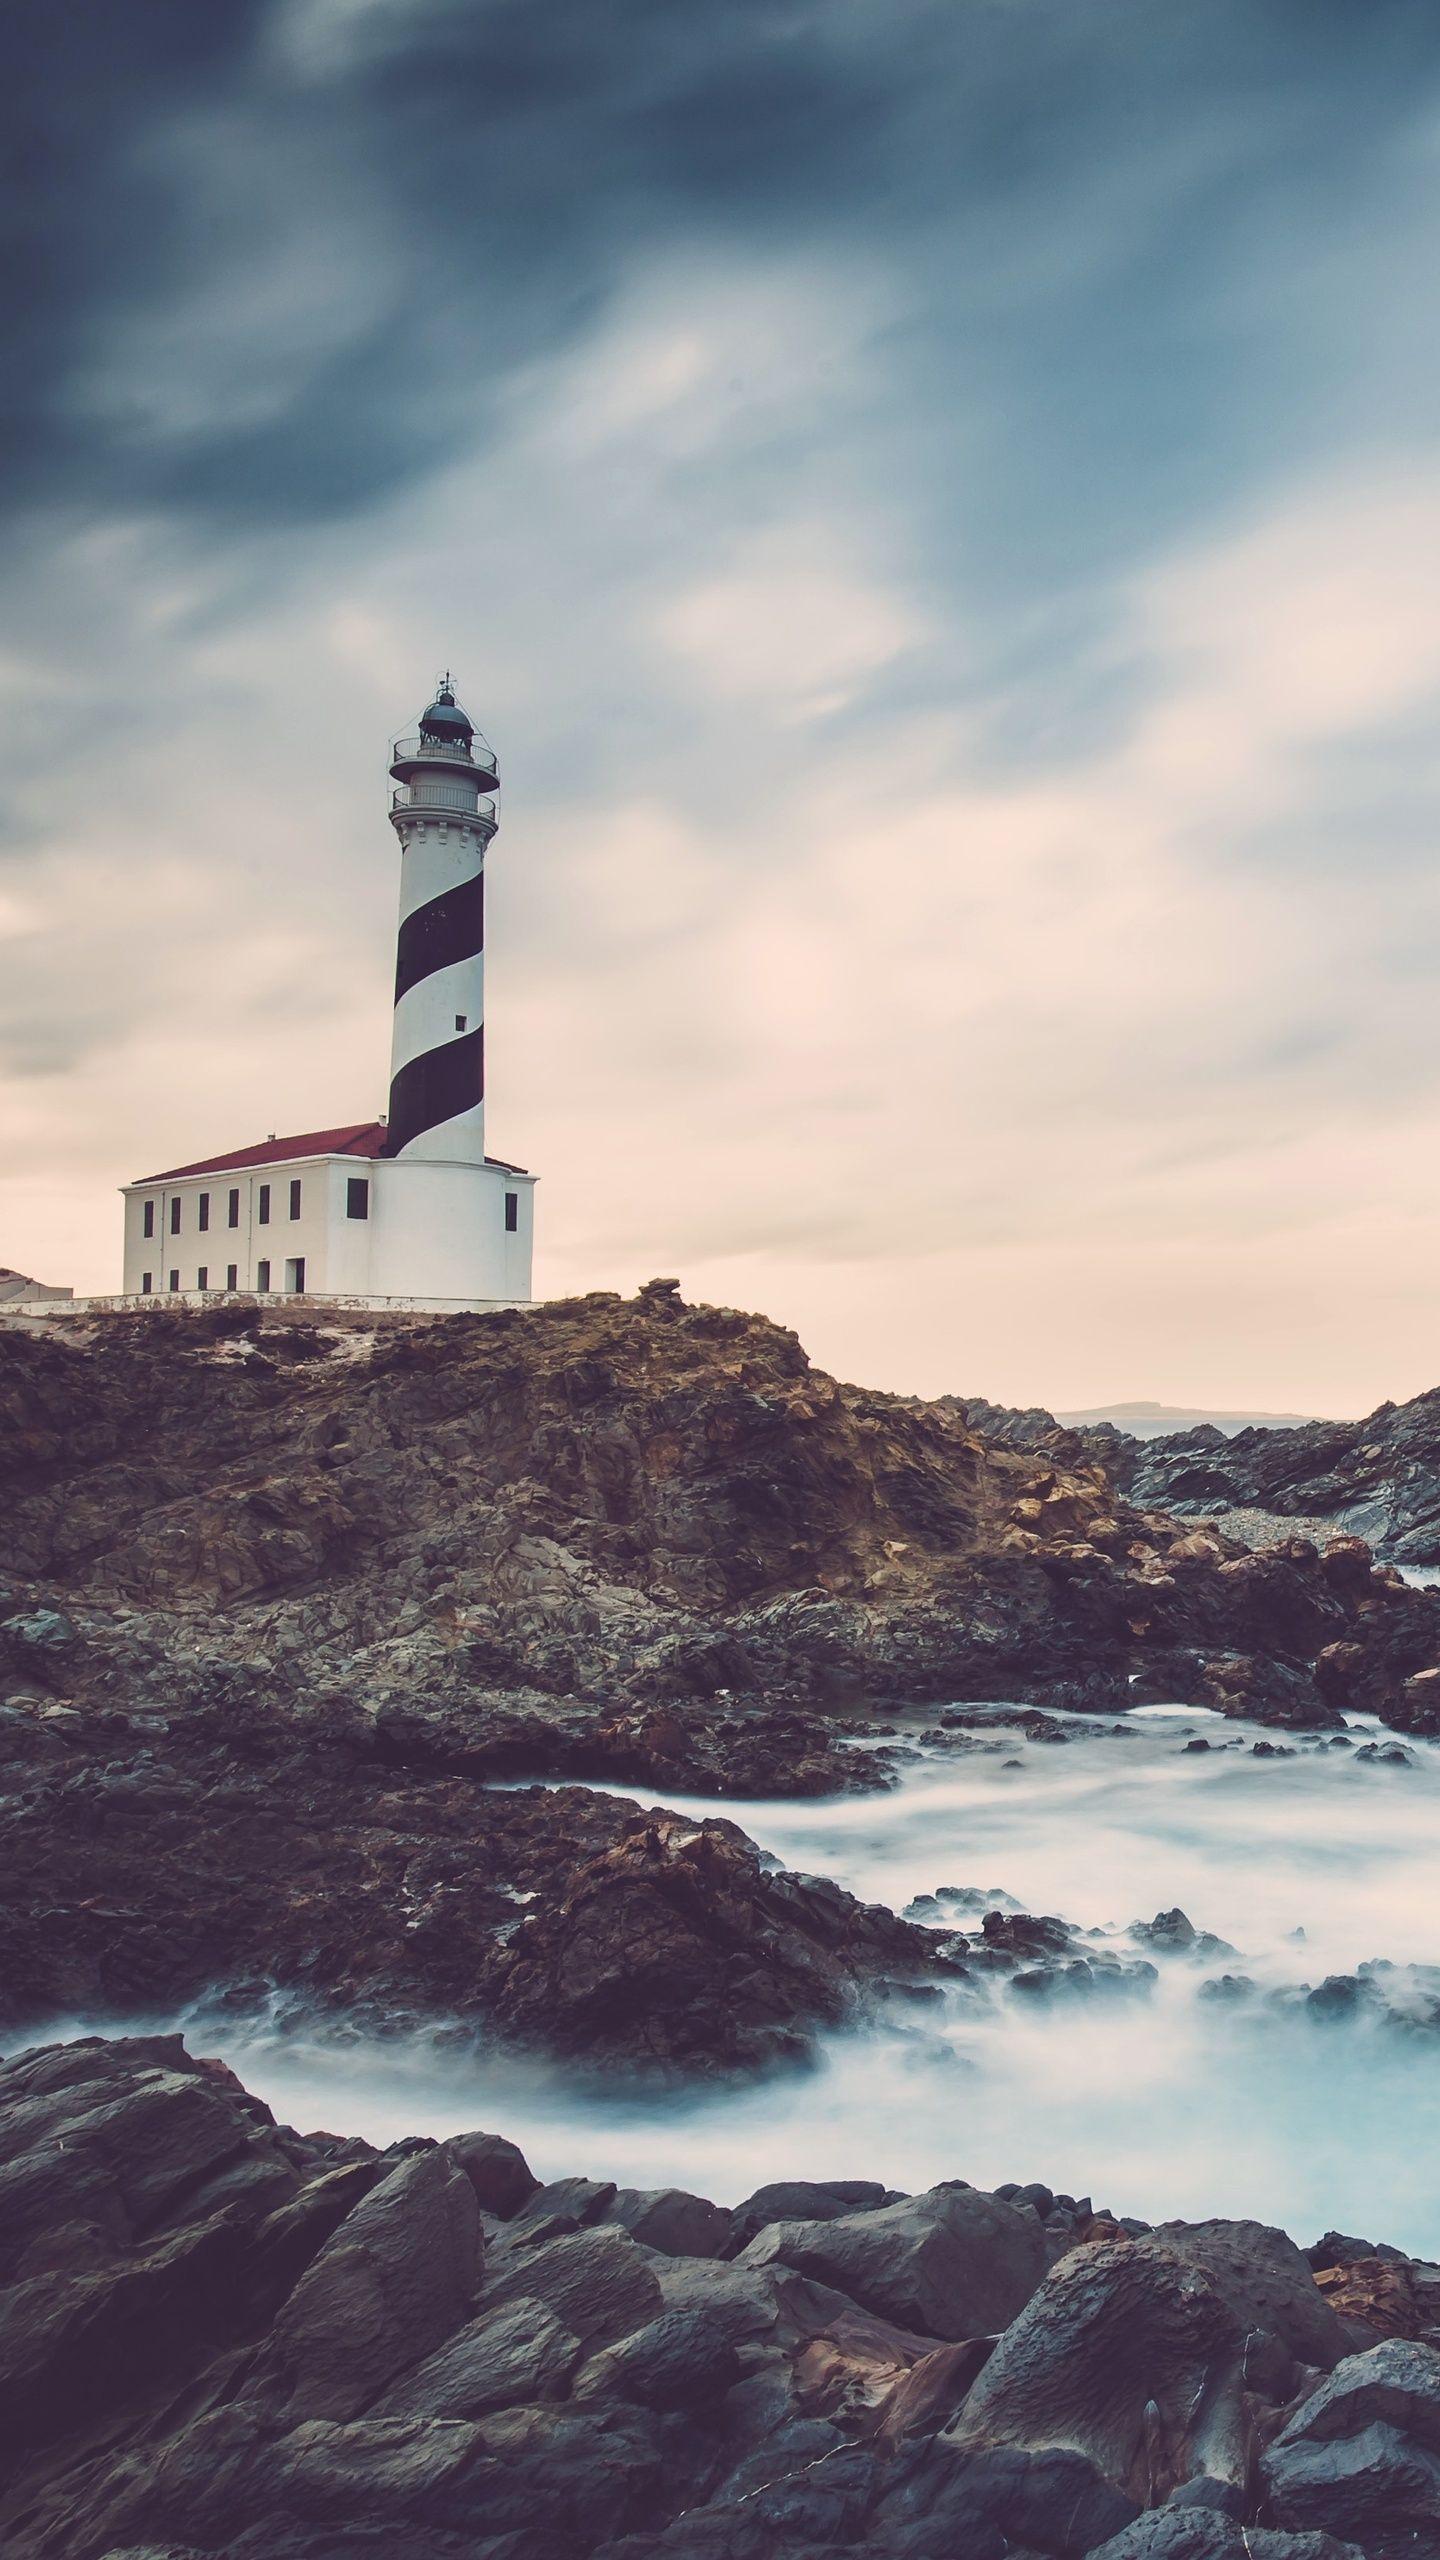 Landscape Wallpaper Samsung S7 New 1440×2560 Lighthouse - Iphone 8 Plus Lighthouse Wallpaper Hd , HD Wallpaper & Backgrounds